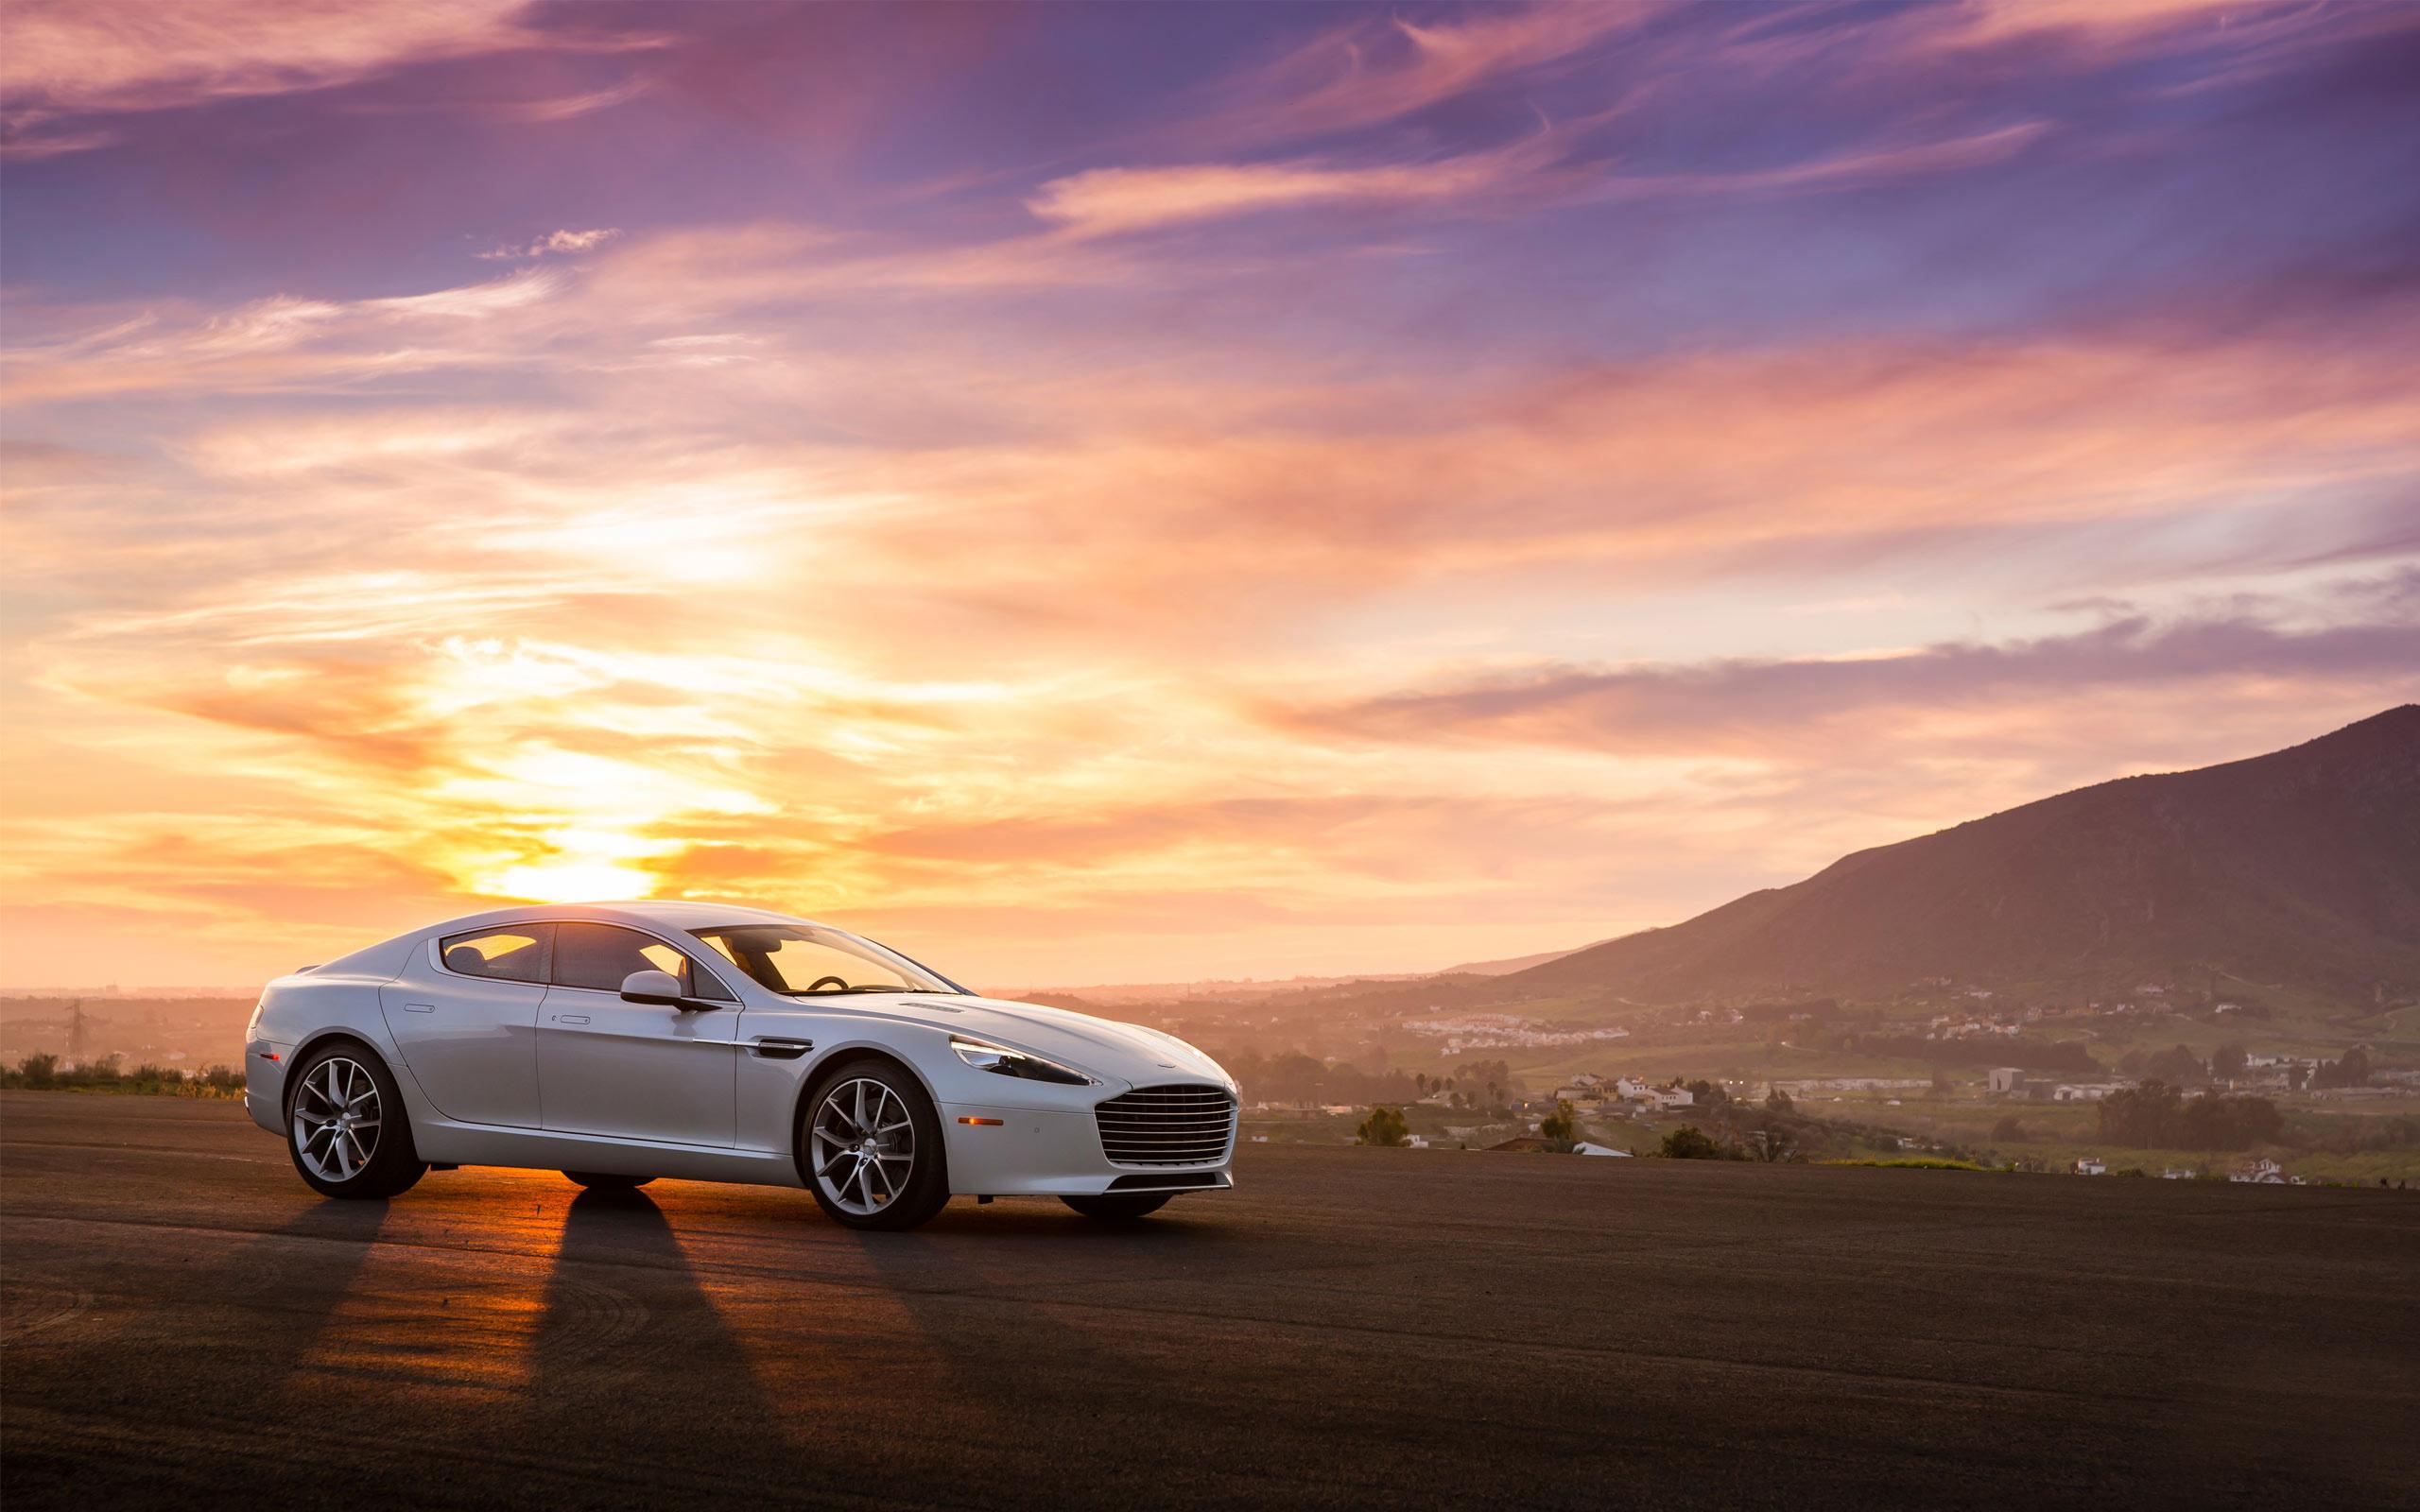 Beautiful Aston Martin Wallpaper 44838 2560x1600px